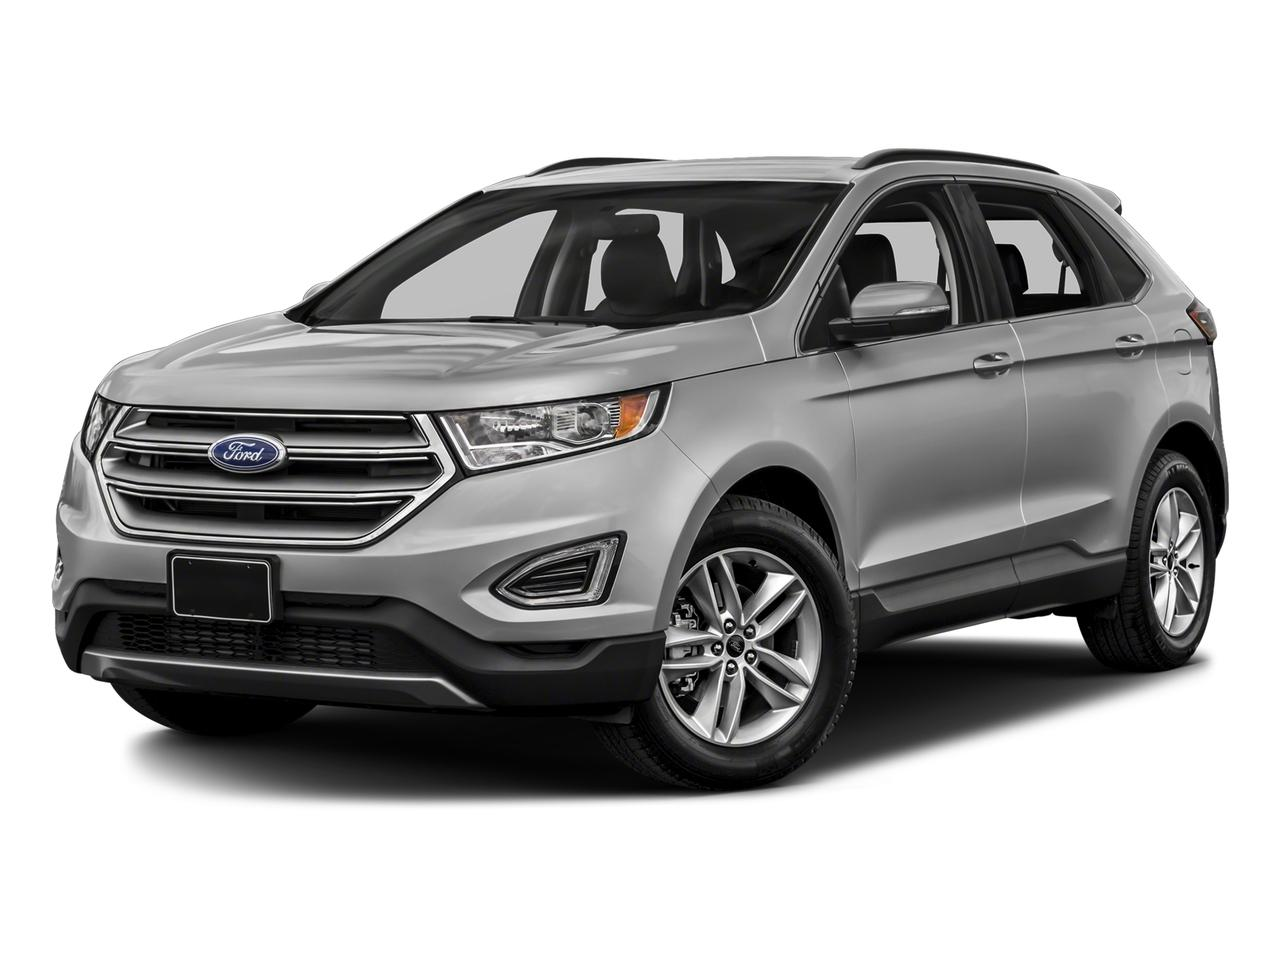 2018 Ford Edge Vehicle Photo in OAK LAWN, IL 60453-2517